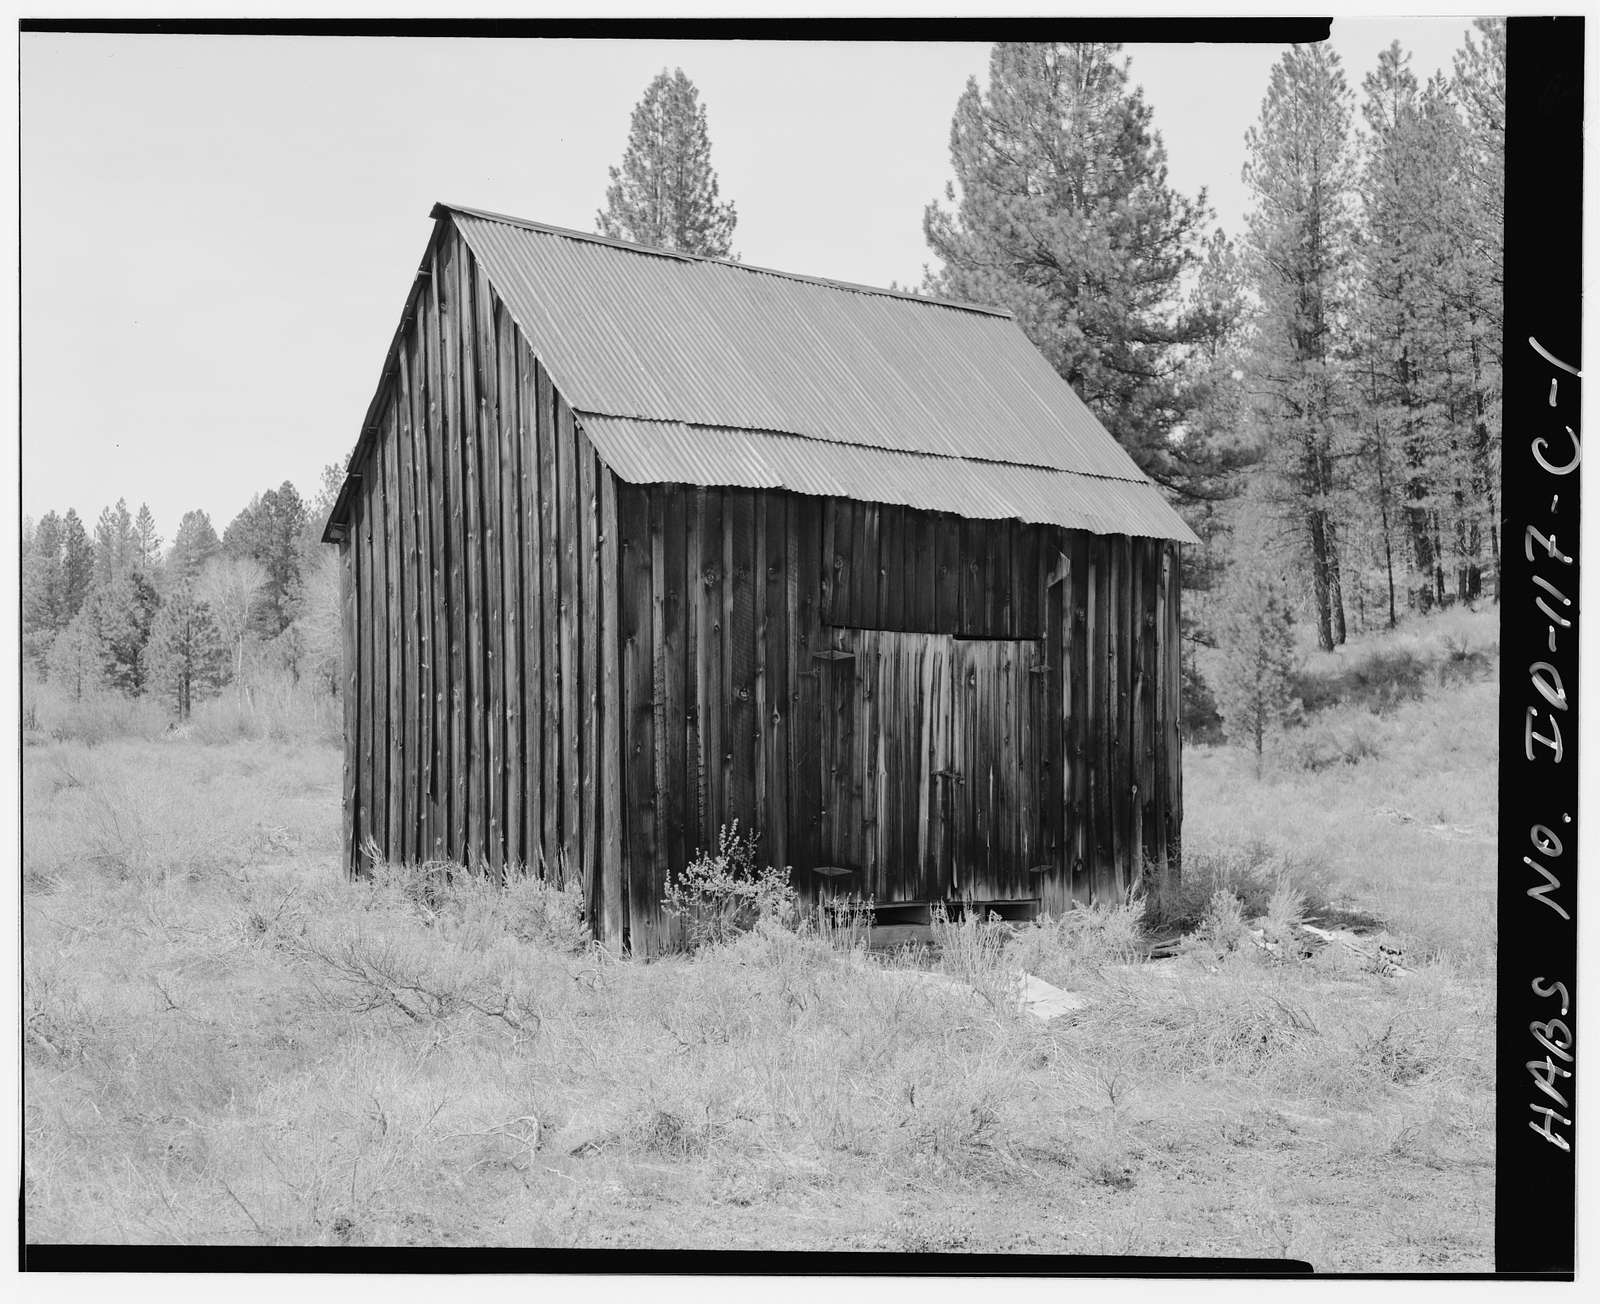 Hiatt Property, Barn, West bank of Woof Creek, 400 feet northwest of intersection of U.S.F.S. Roads 651 & 349, Placerville, Boise County, ID